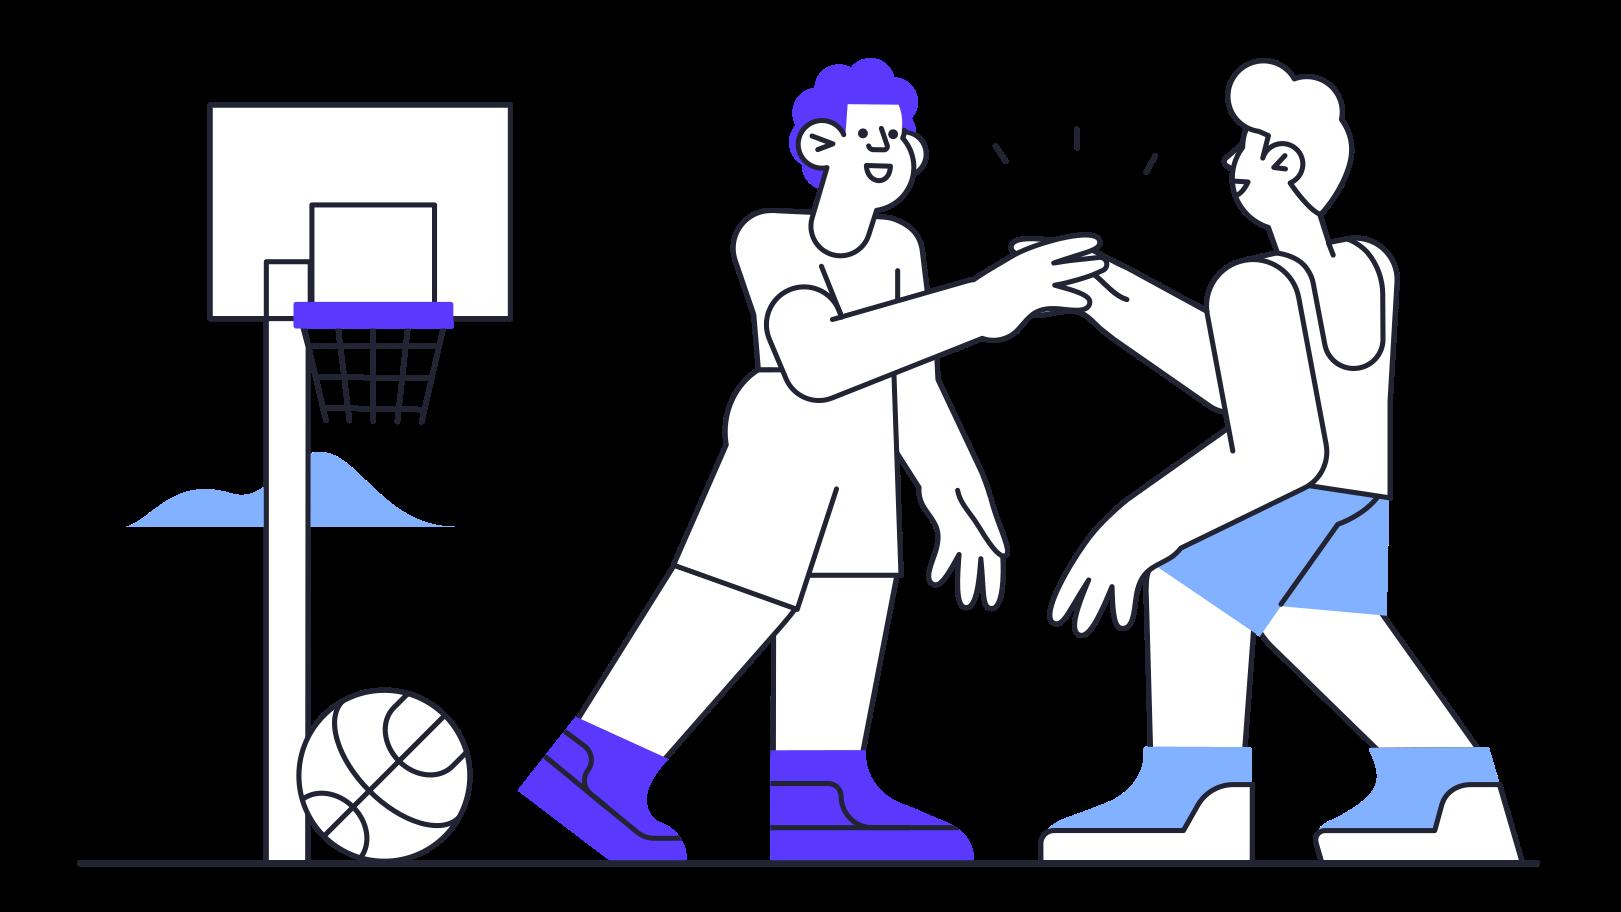 Basketball game Clipart illustration in PNG, SVG